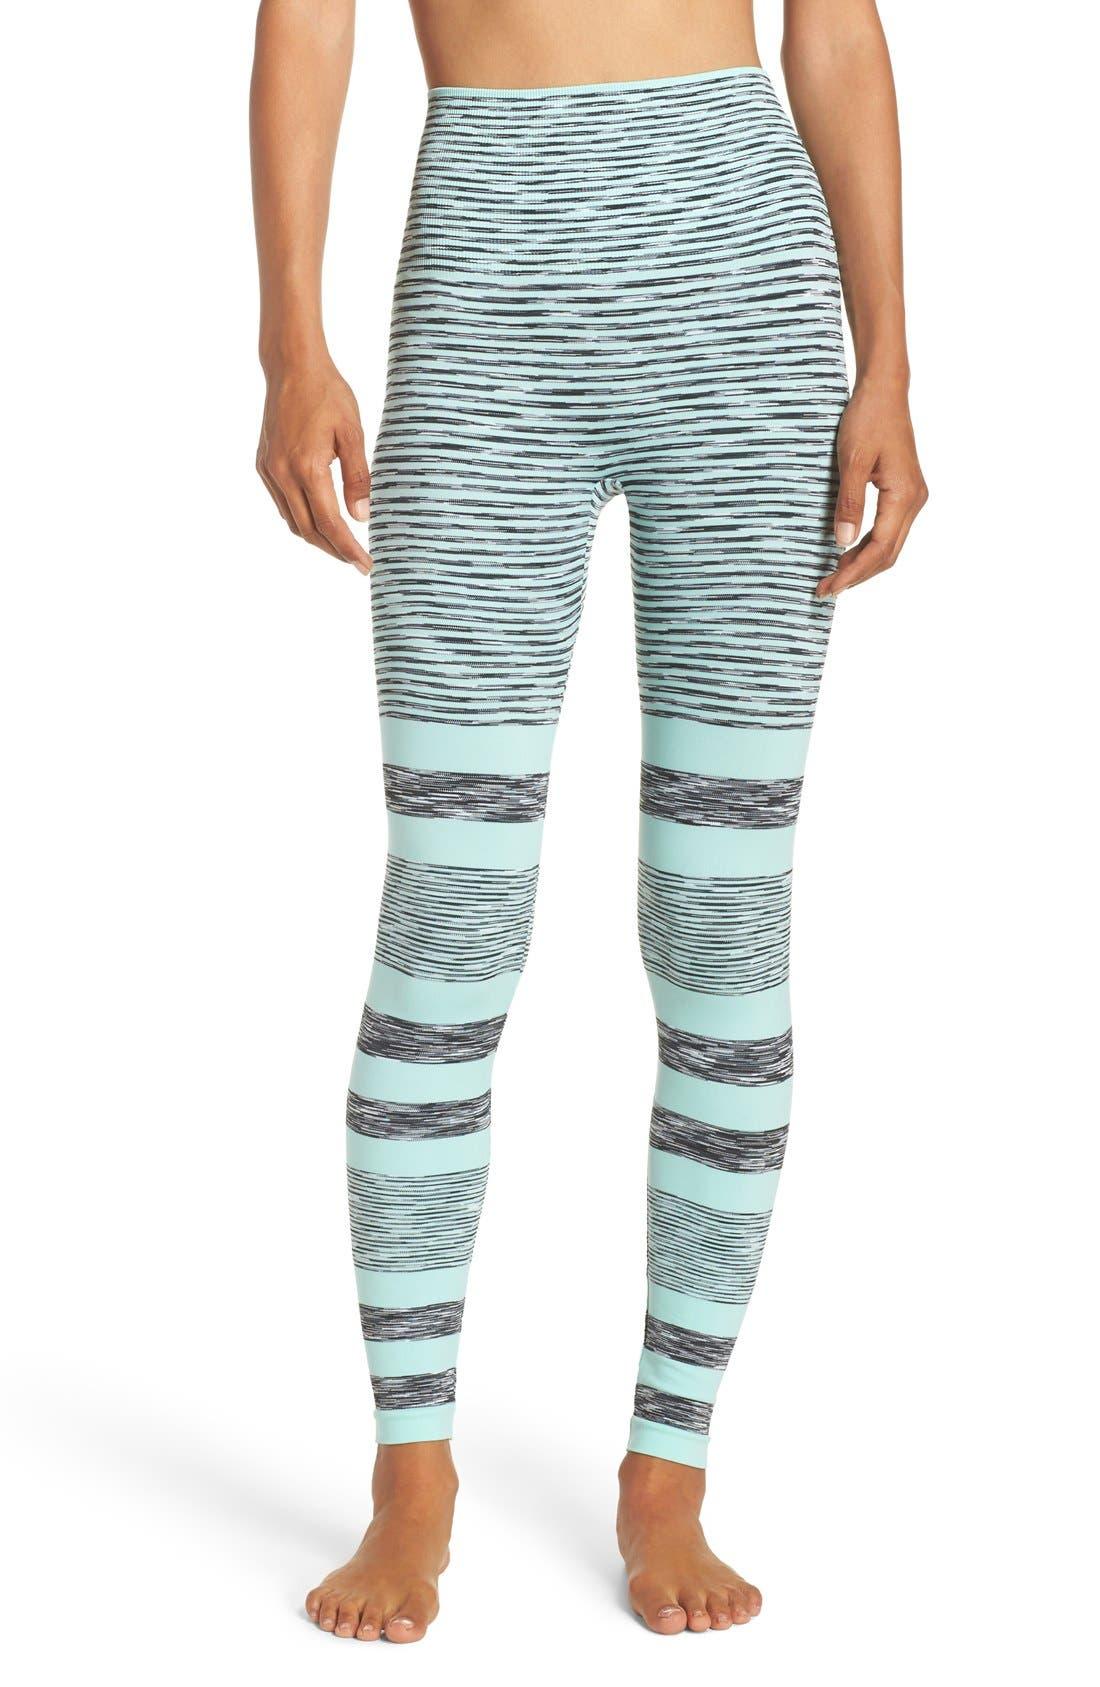 Main Image - Climawear 'Raise the Bar' High Waist Seamless Leggings